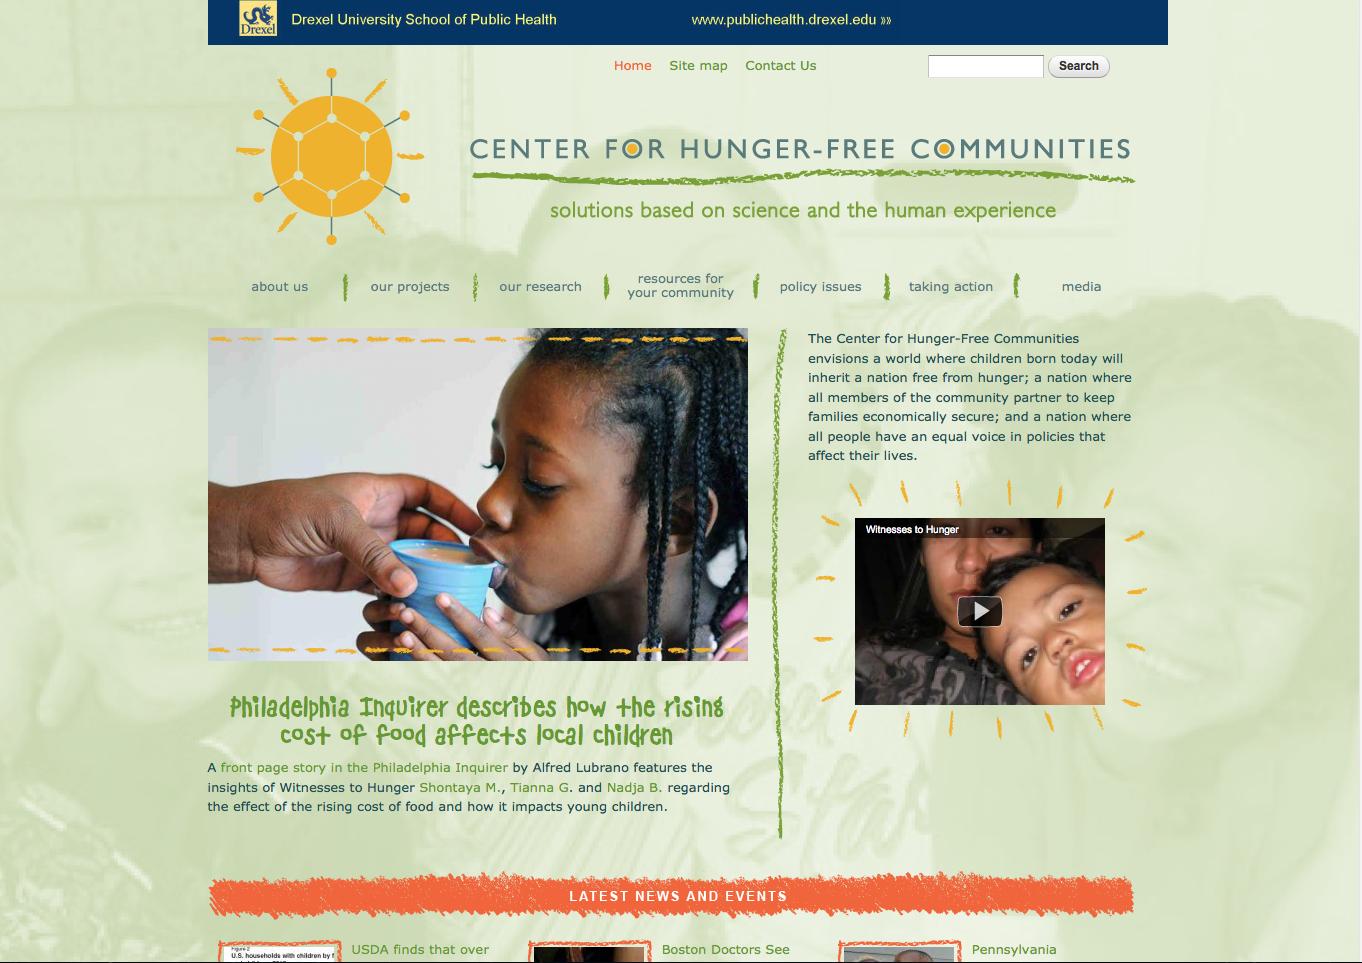 Center for Hunger Free Communities website